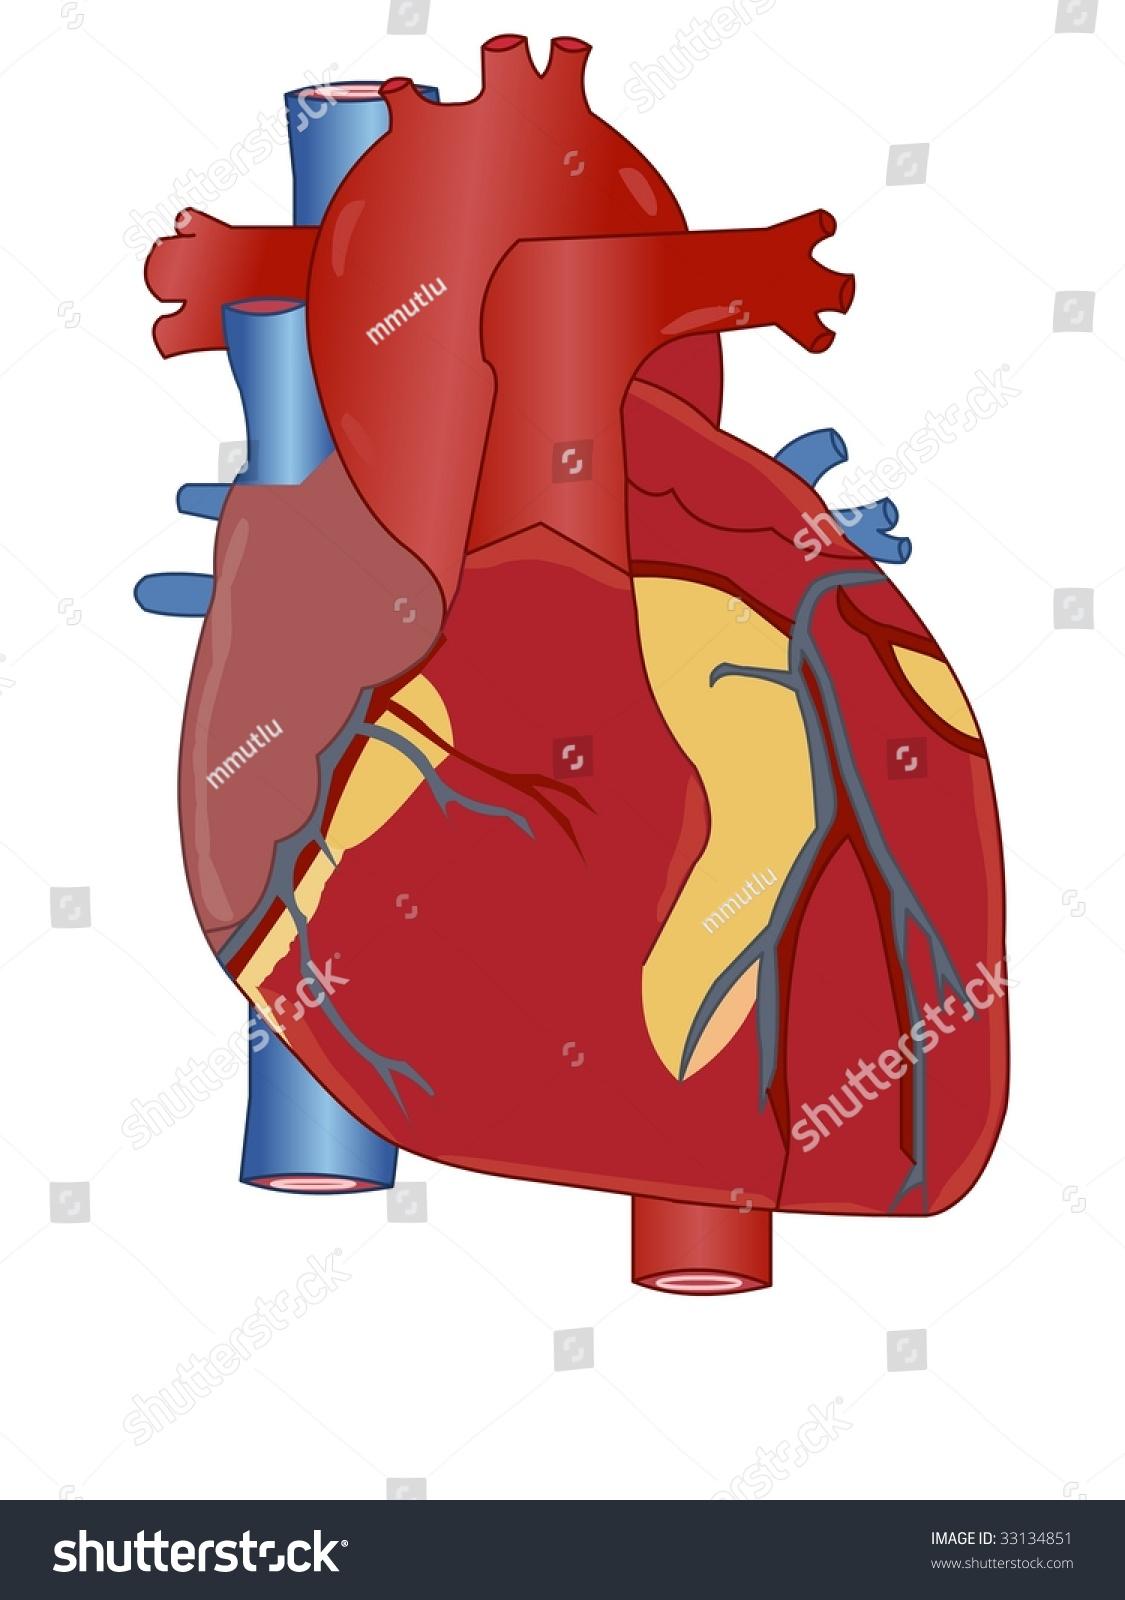 Reptile heart anatomy